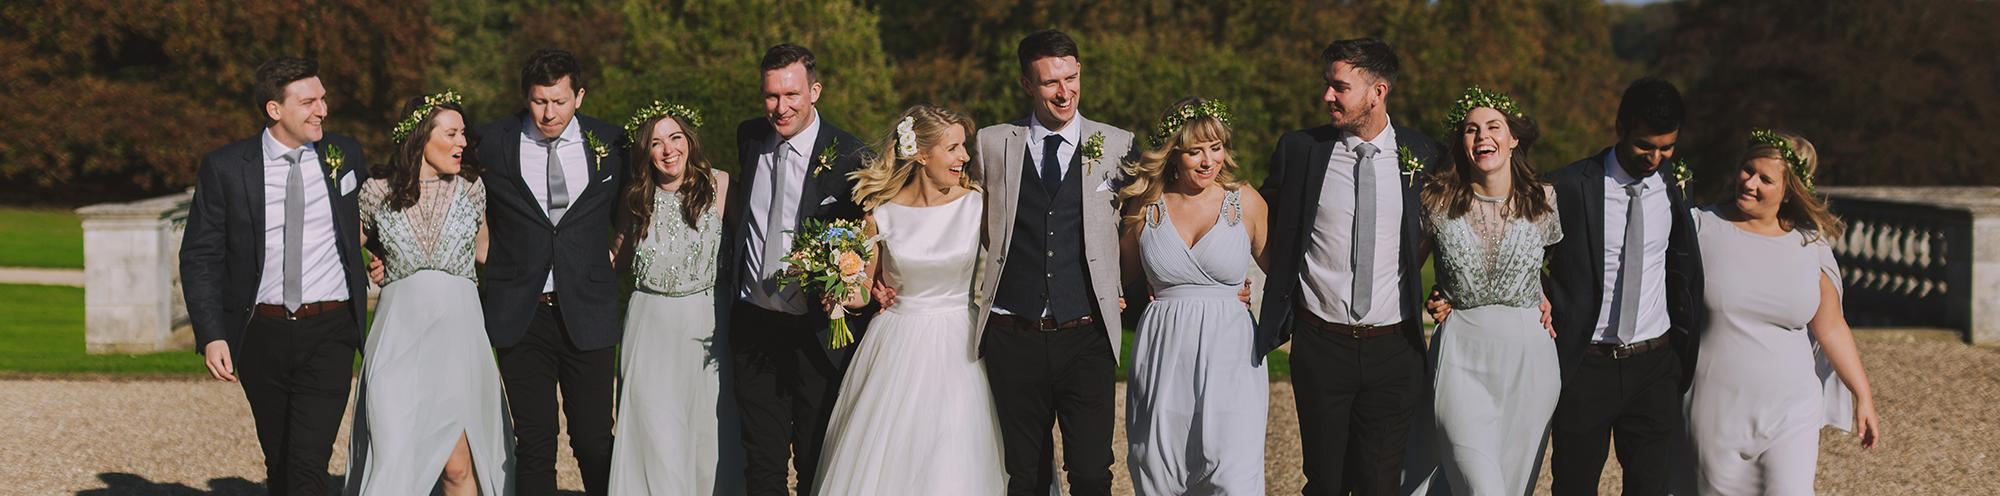 sledmere house wedding photography 1.jpg